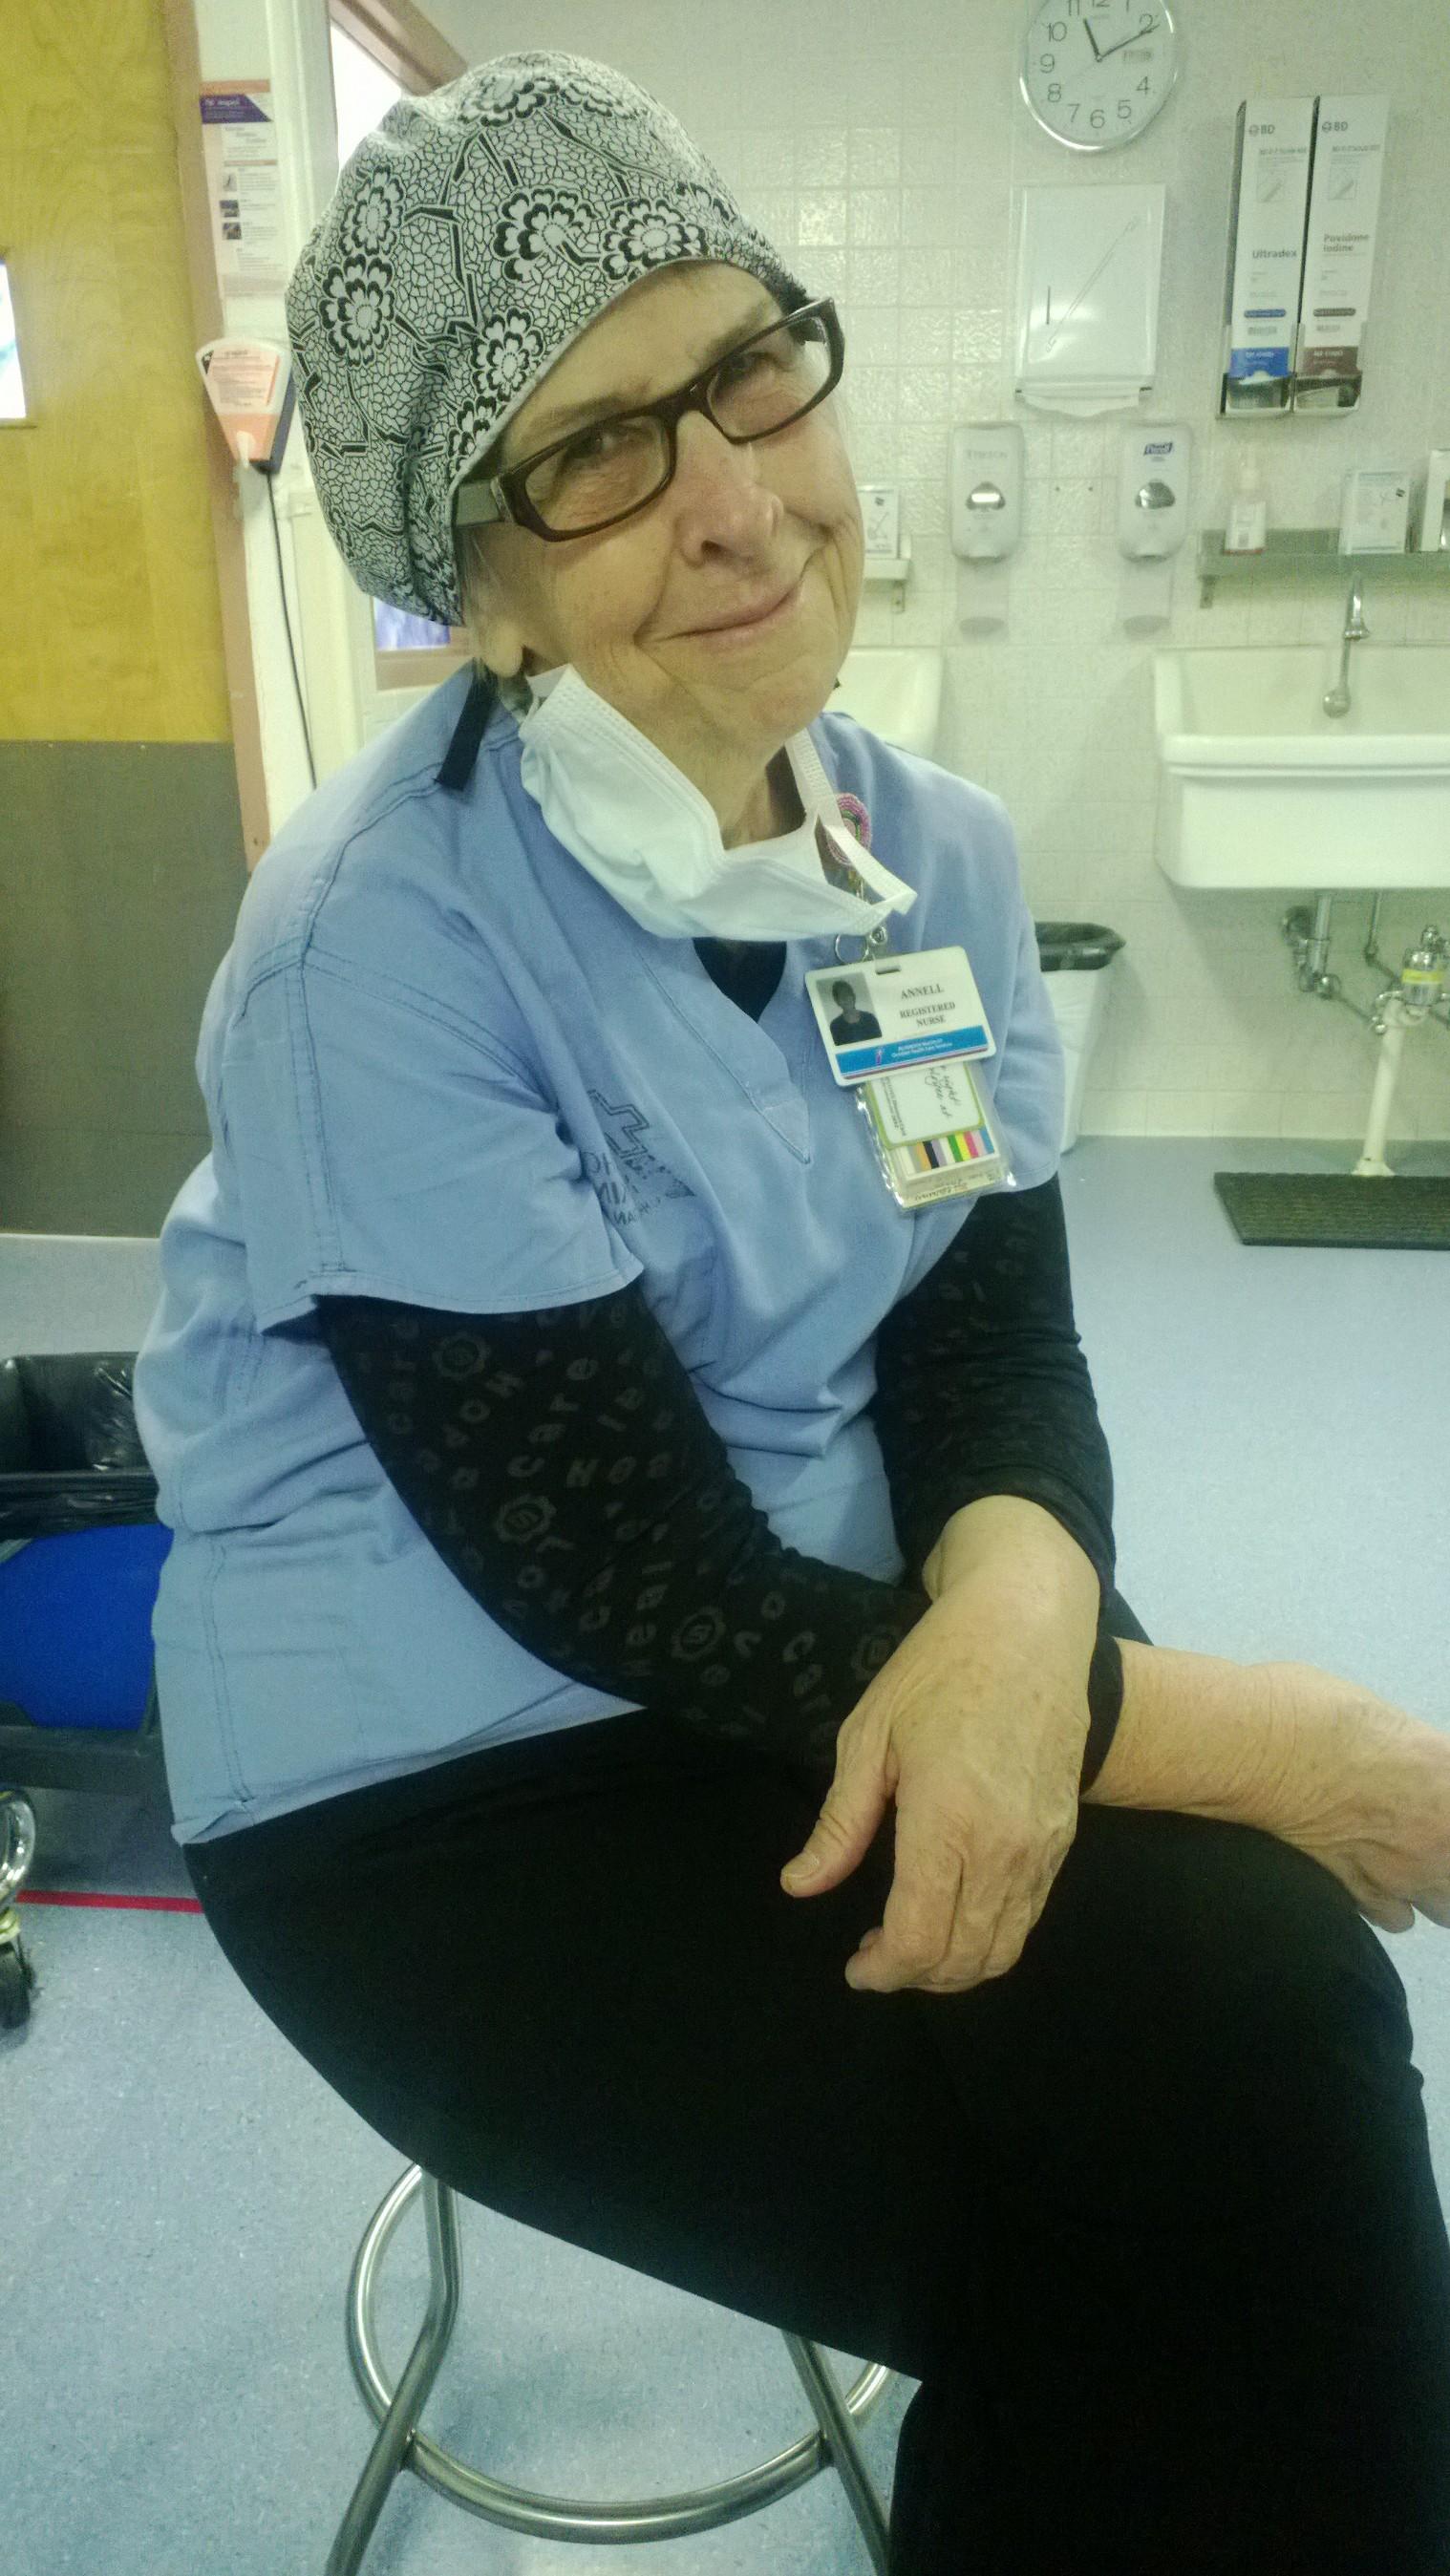 Real nurse in hospital